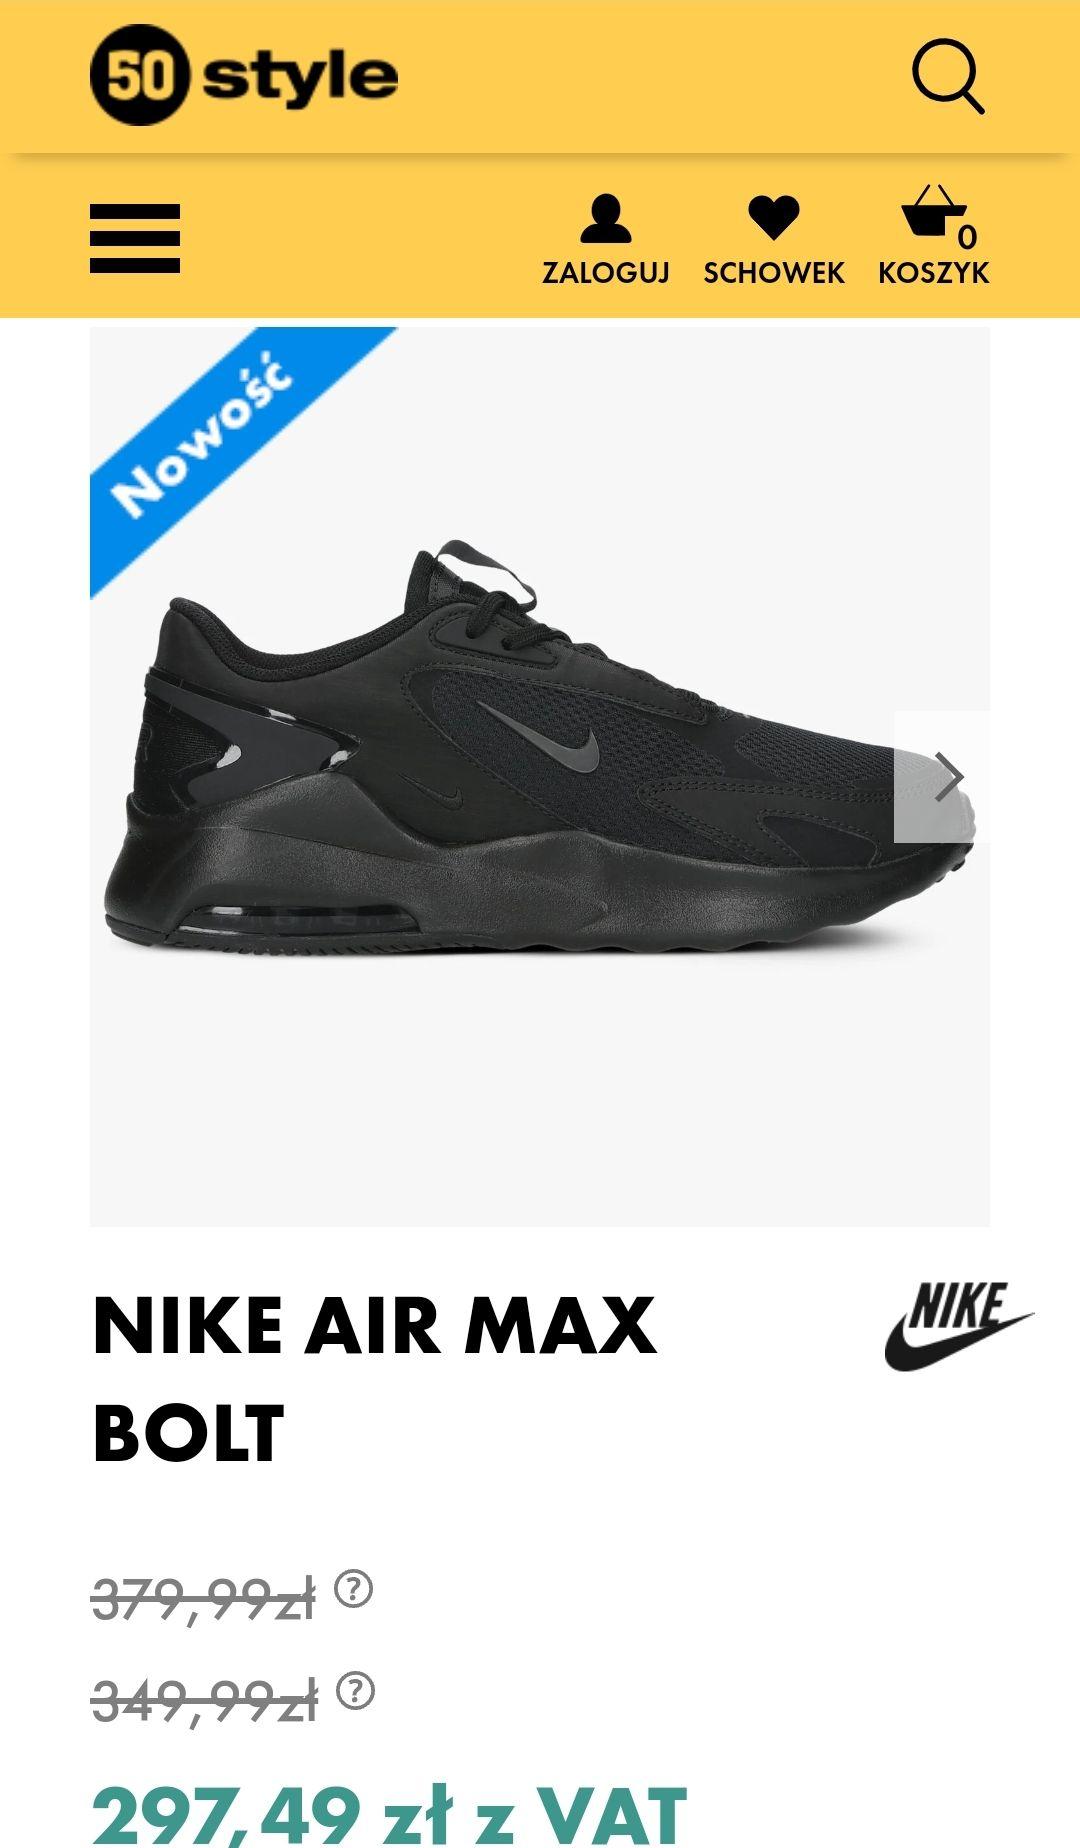 Buty męskie Nike Air Max Bolt - 50 style